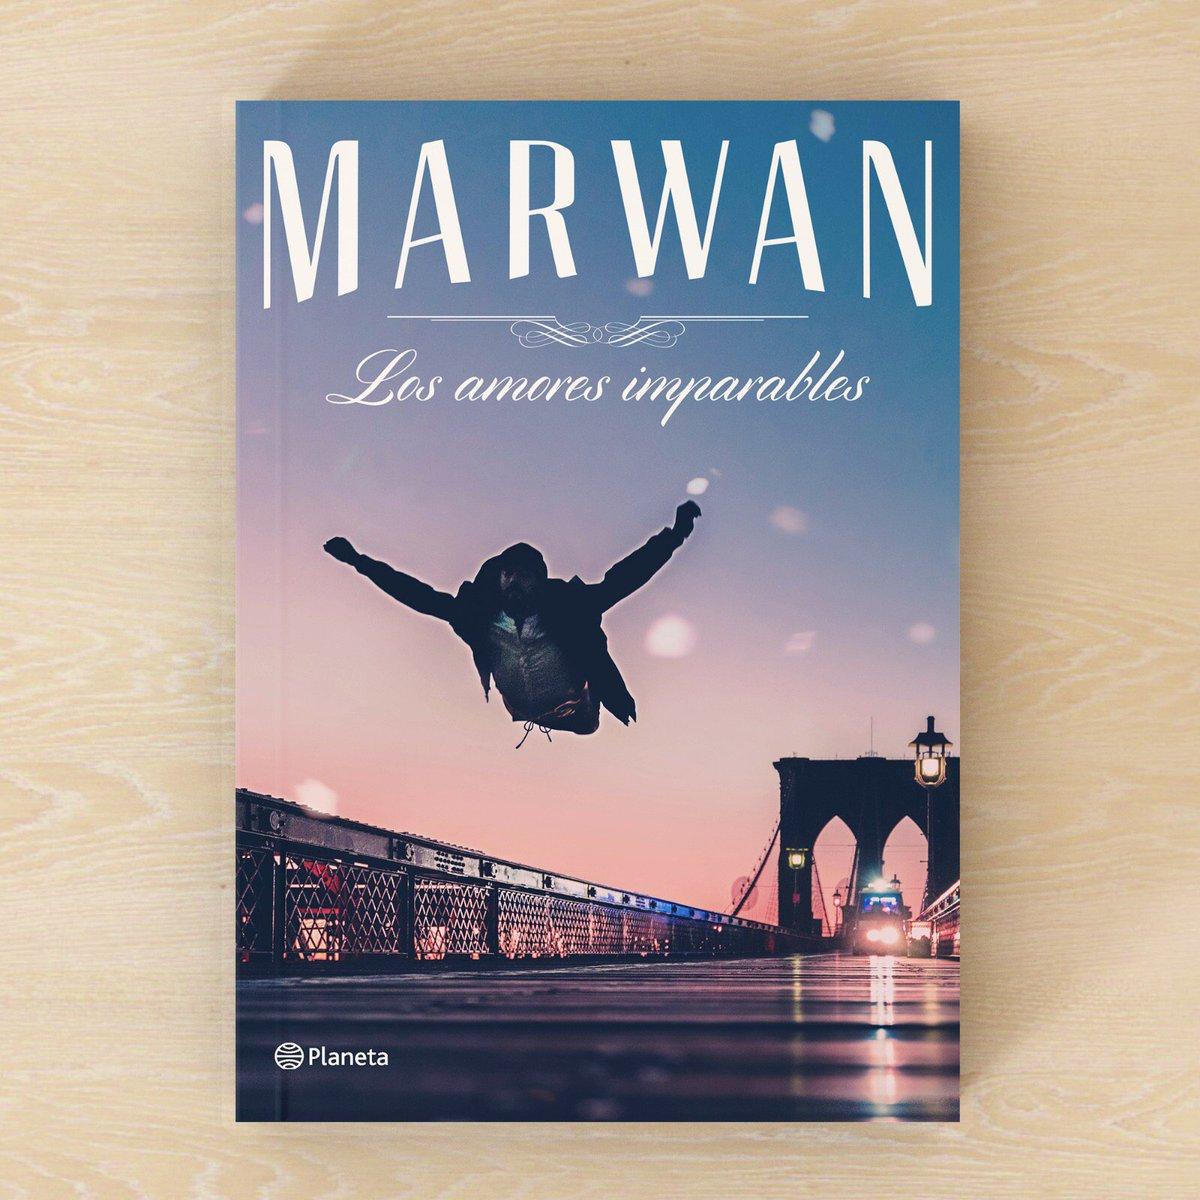 Marwan Marwanmusica  Twitter